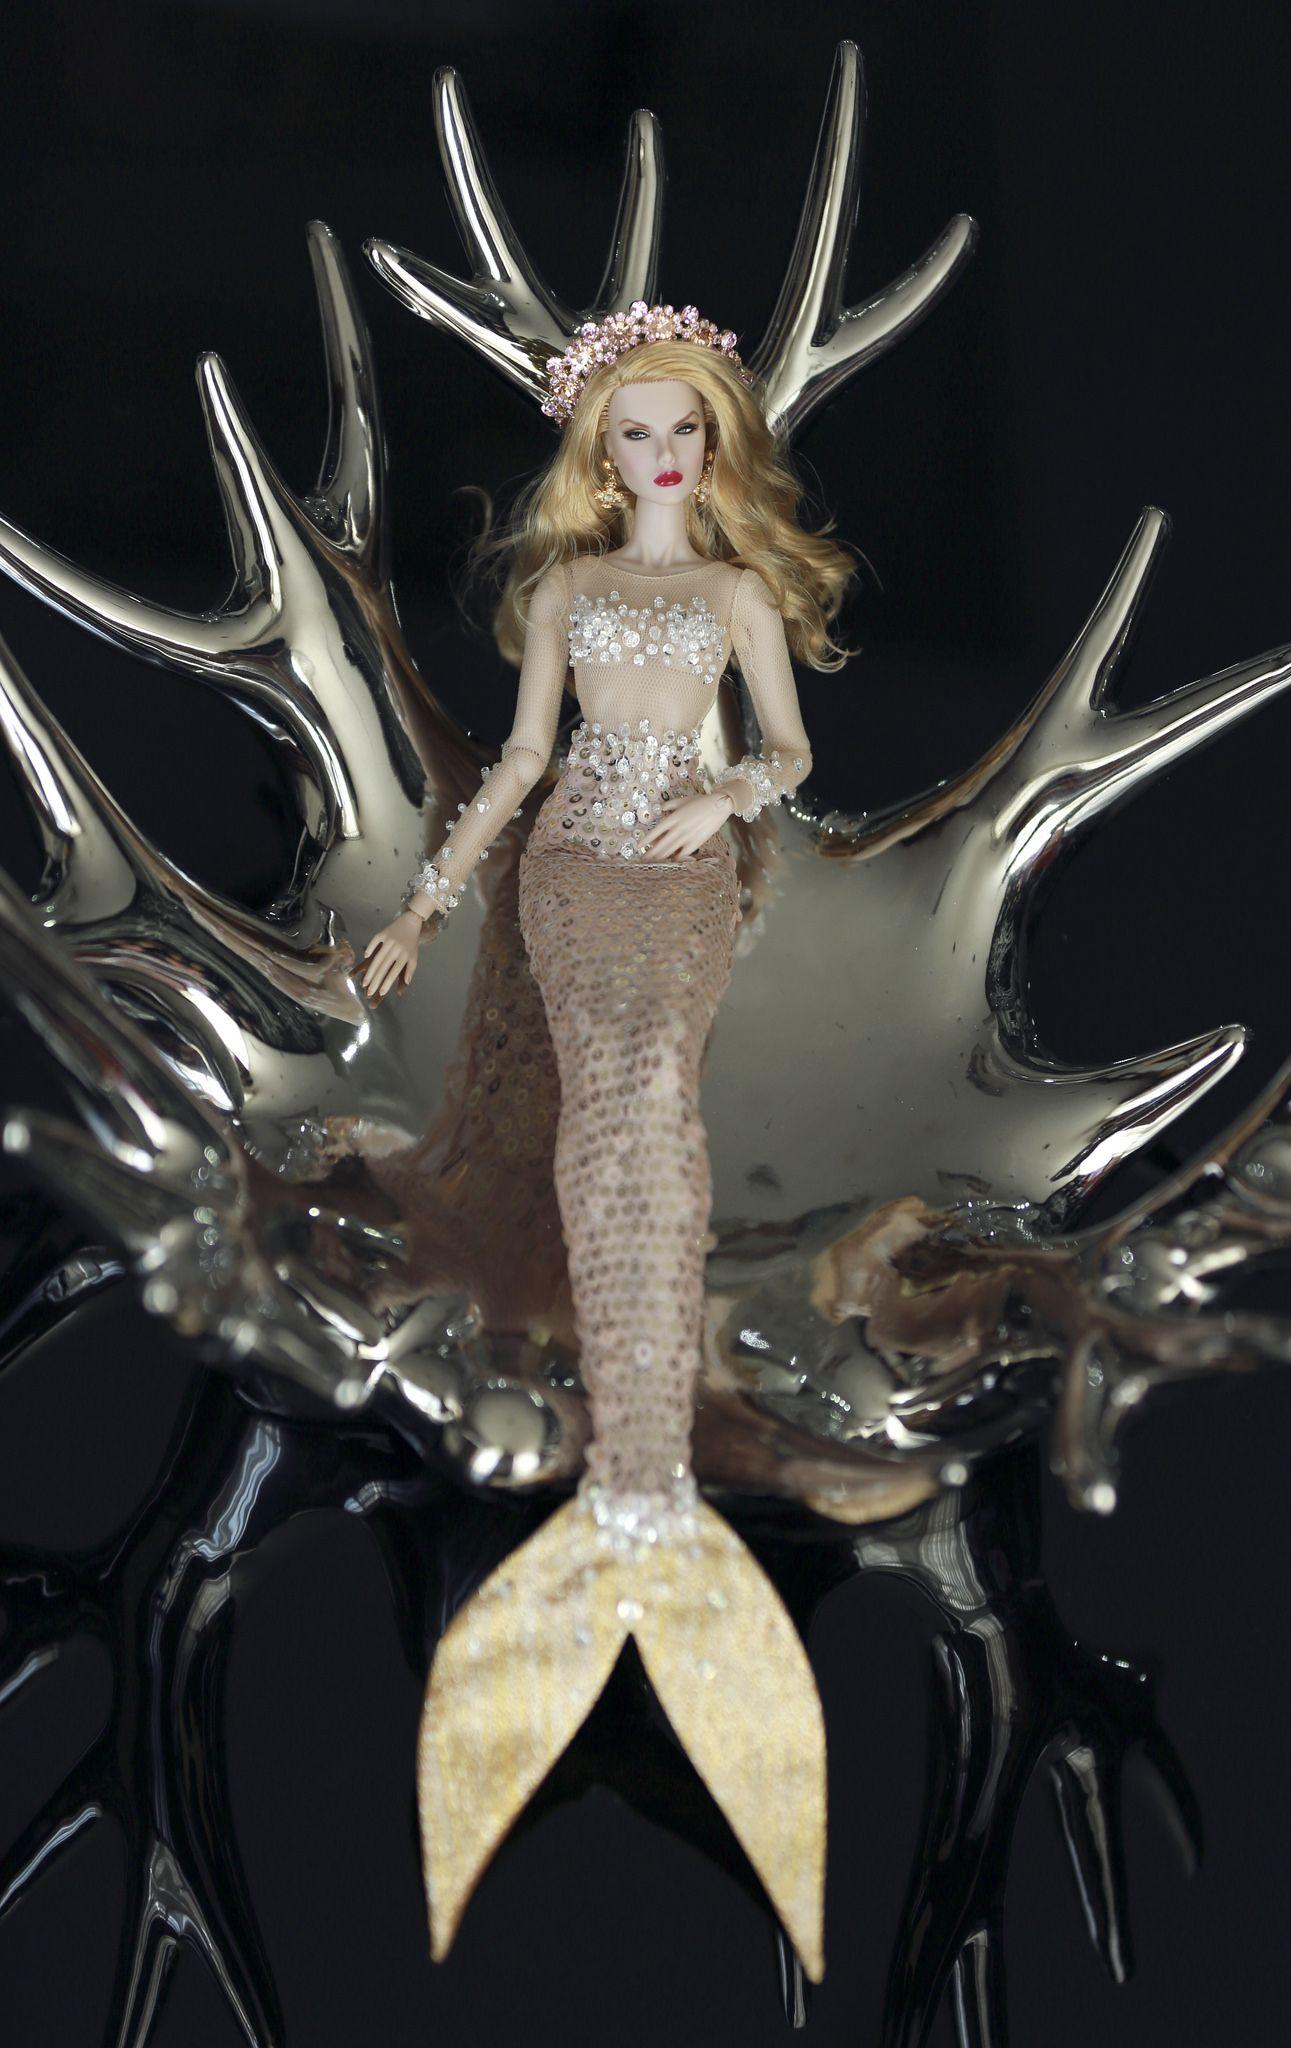 Dasha Mermaid Outfit By Rimdoll Barbie Fashion Royalty Mermaid Barbie Barbie Miss